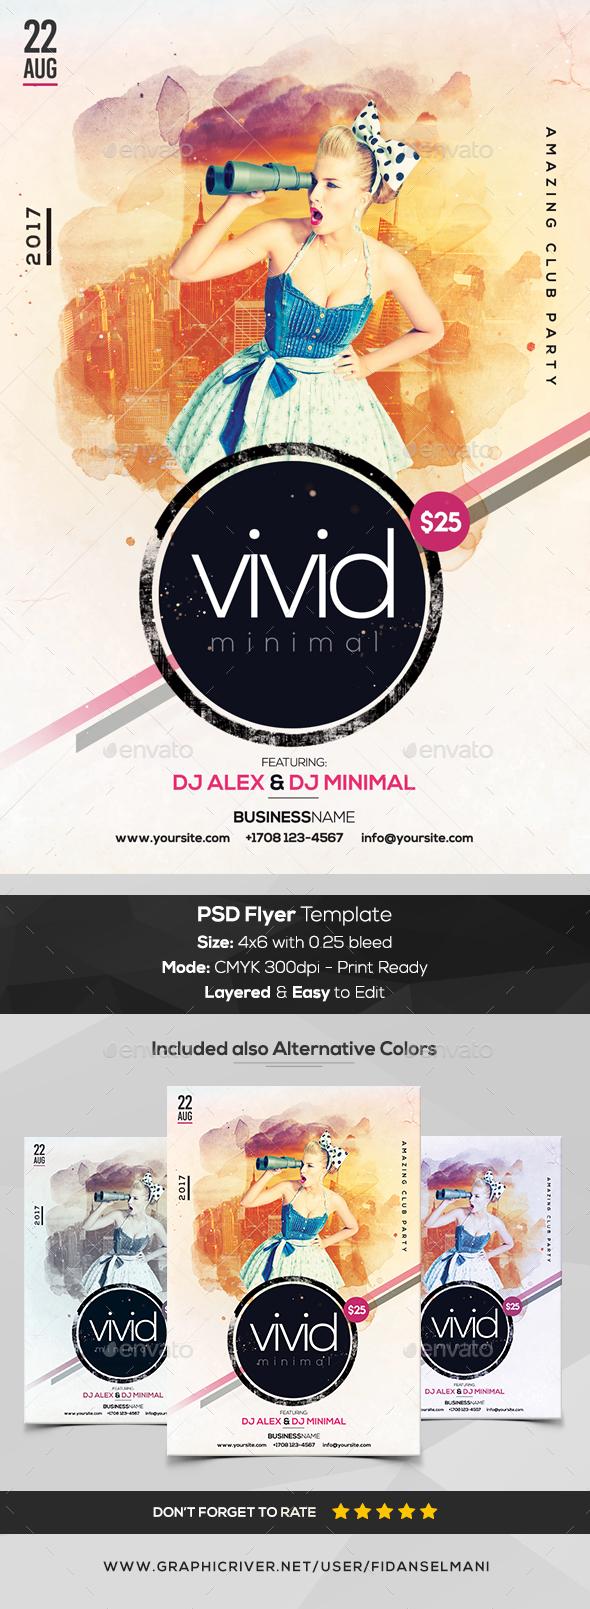 Vivid Minimal - PSD Flyer Template - Events Flyers